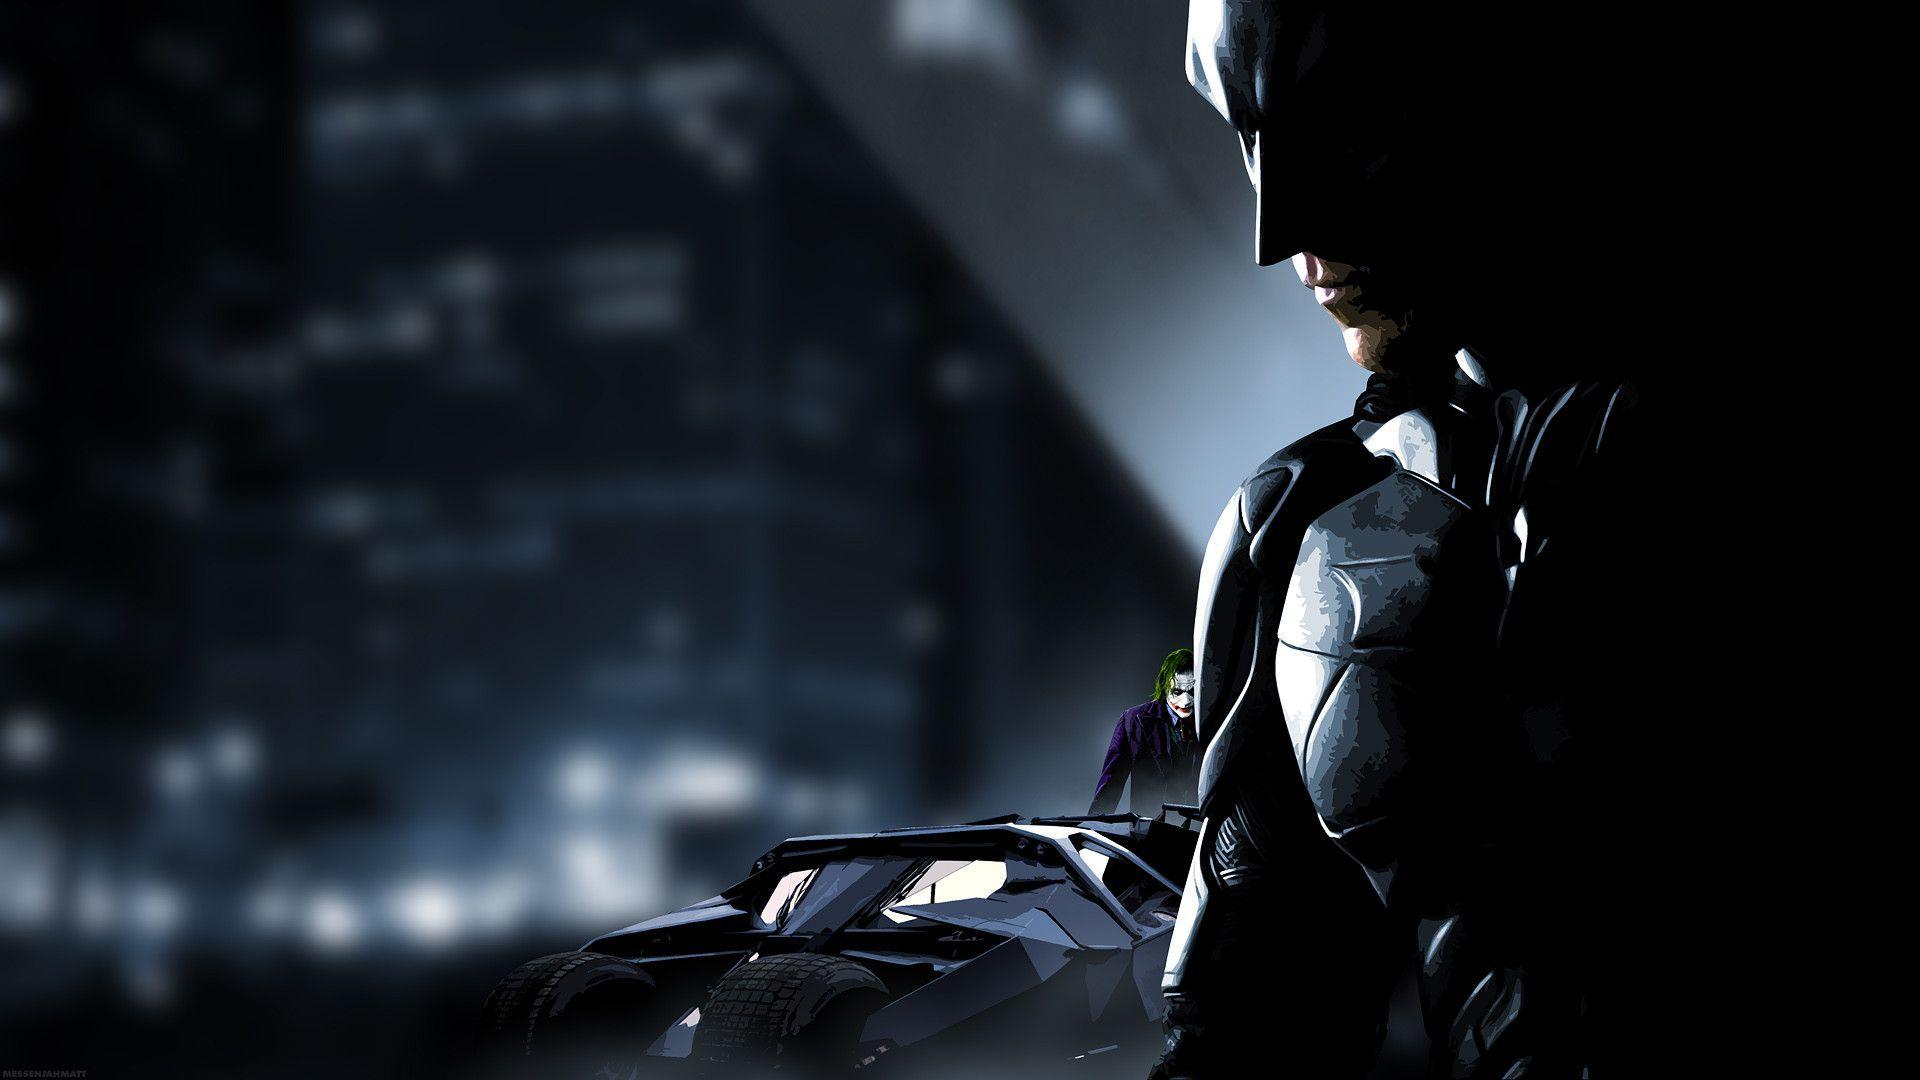 Hd wallpaper gallery - Batman The Dark Knight Wallpapers Gallery En Download